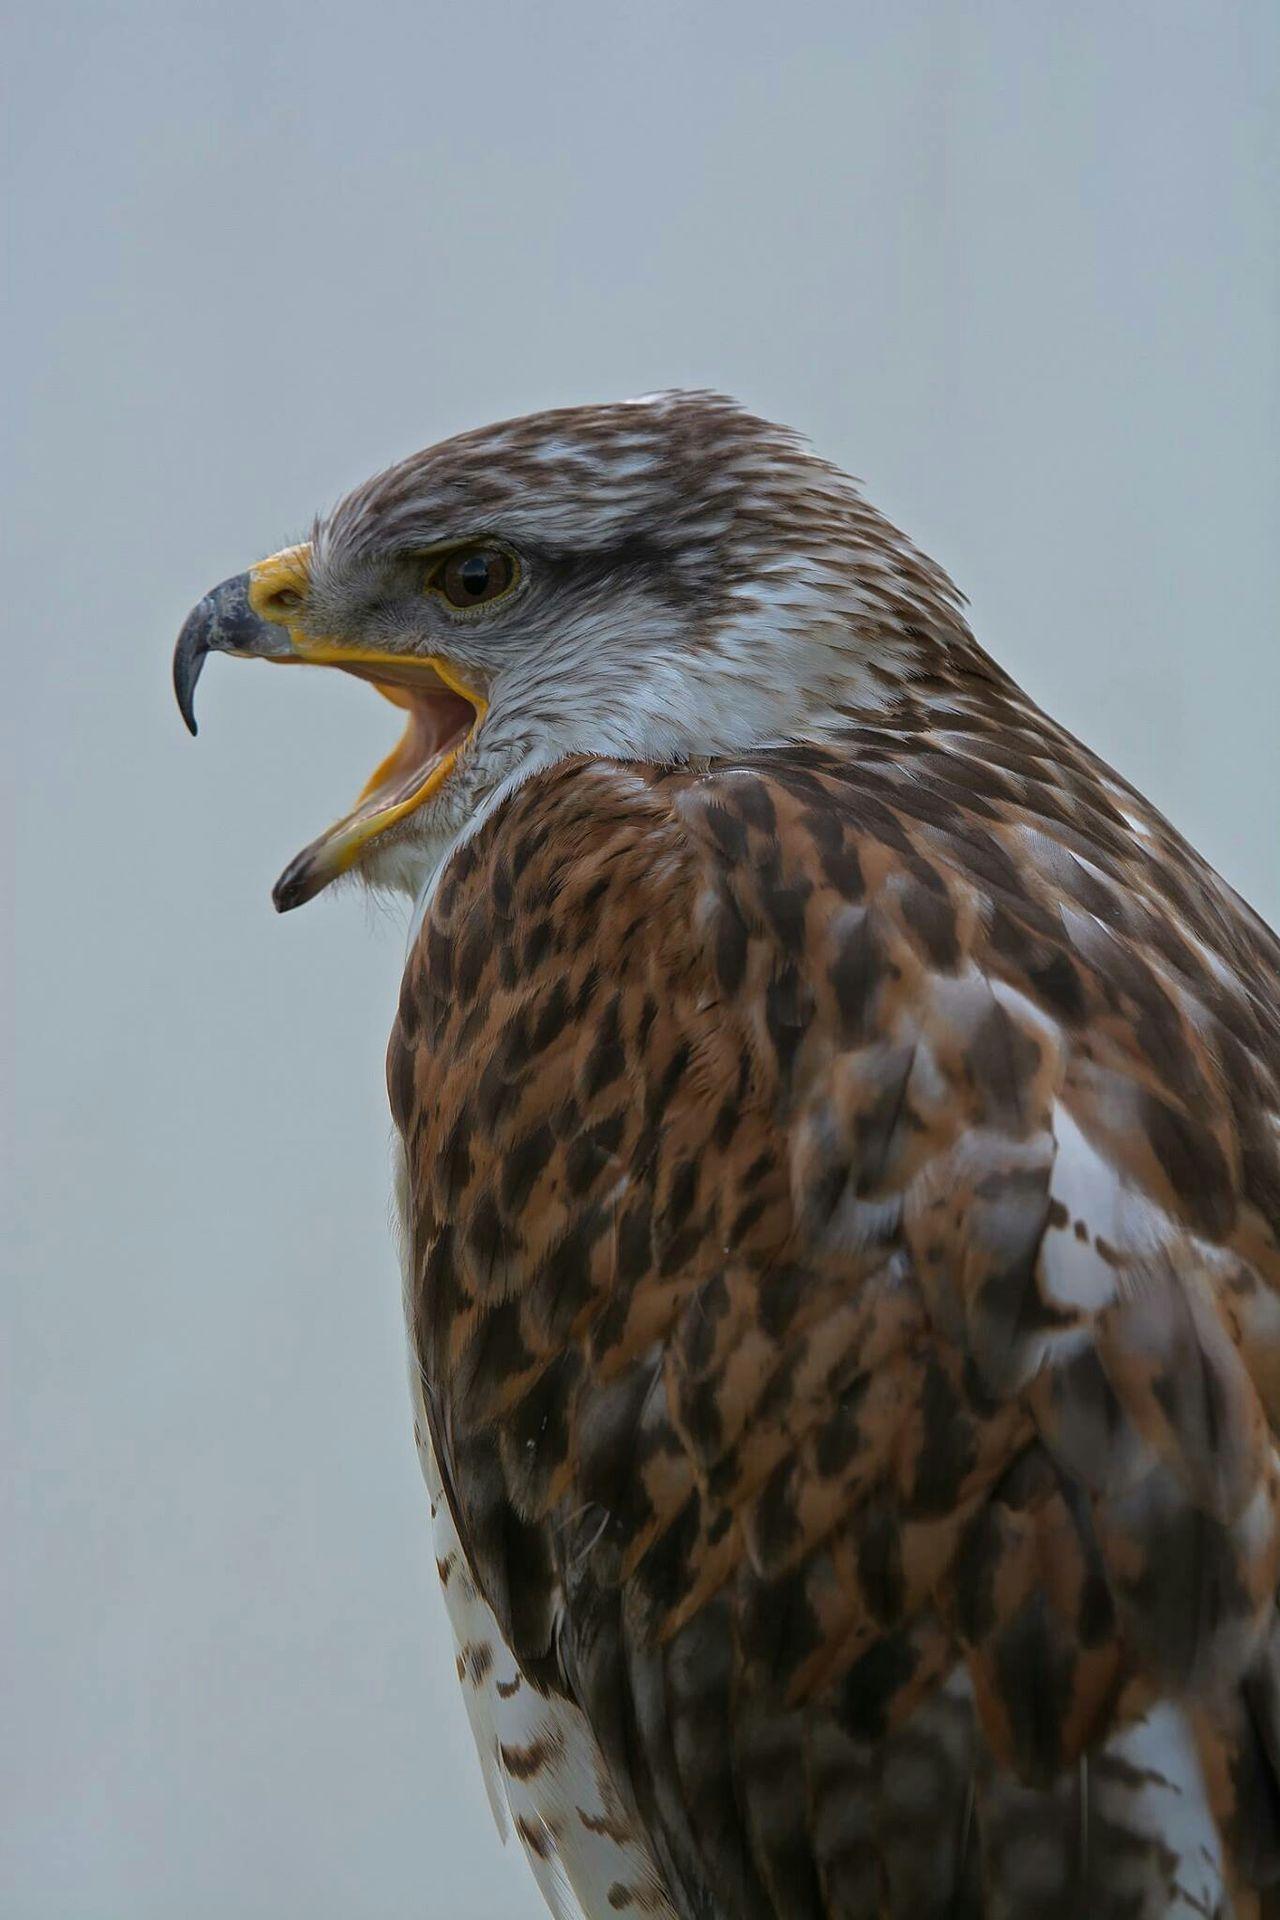 Bird Of Prey Wildlife & Nature Animaux Oiseaux Predatory Predator Rapace  France Gironde